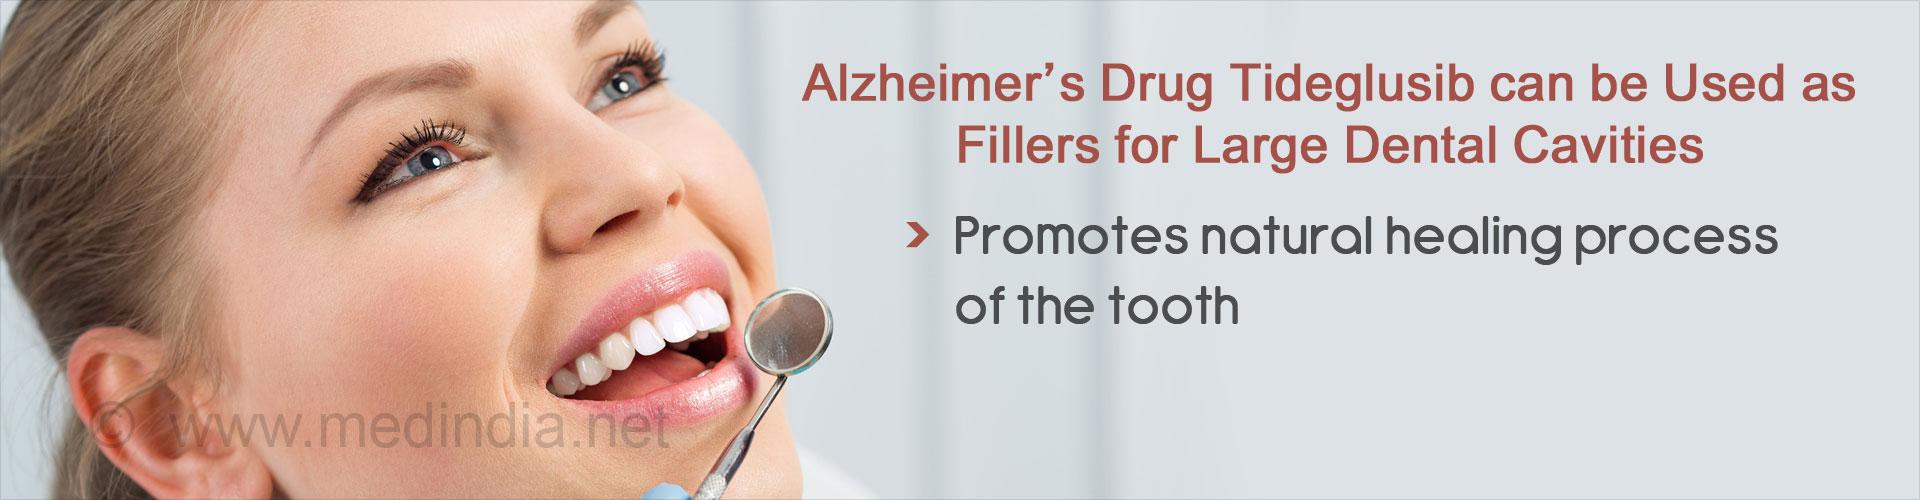 Tideglusib Drug - Possible New Treatment for Dental Cavities